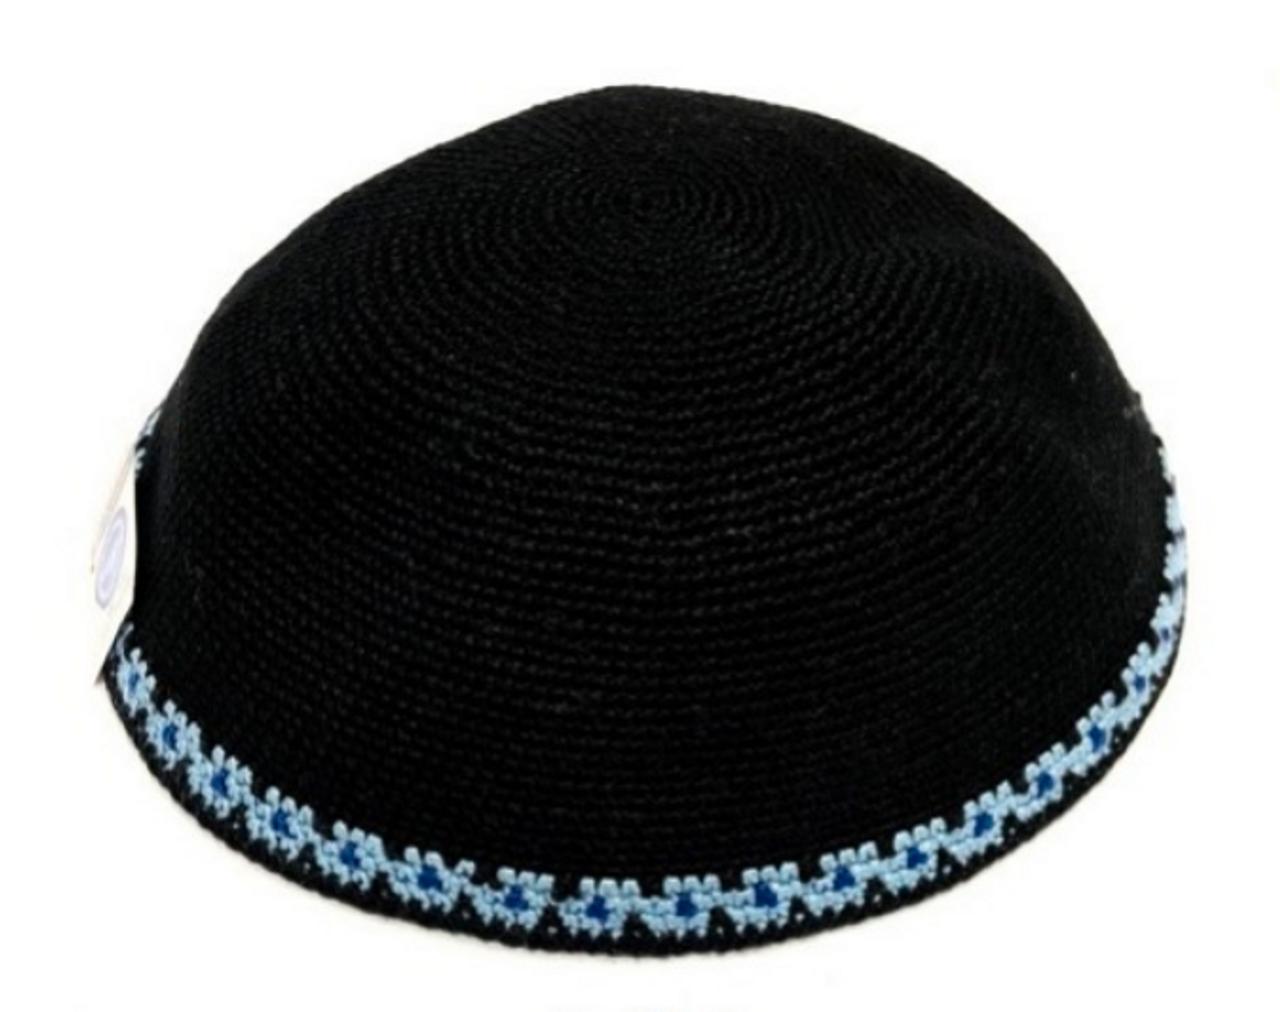 Black DMC Knitted Kippah with Blue Trim